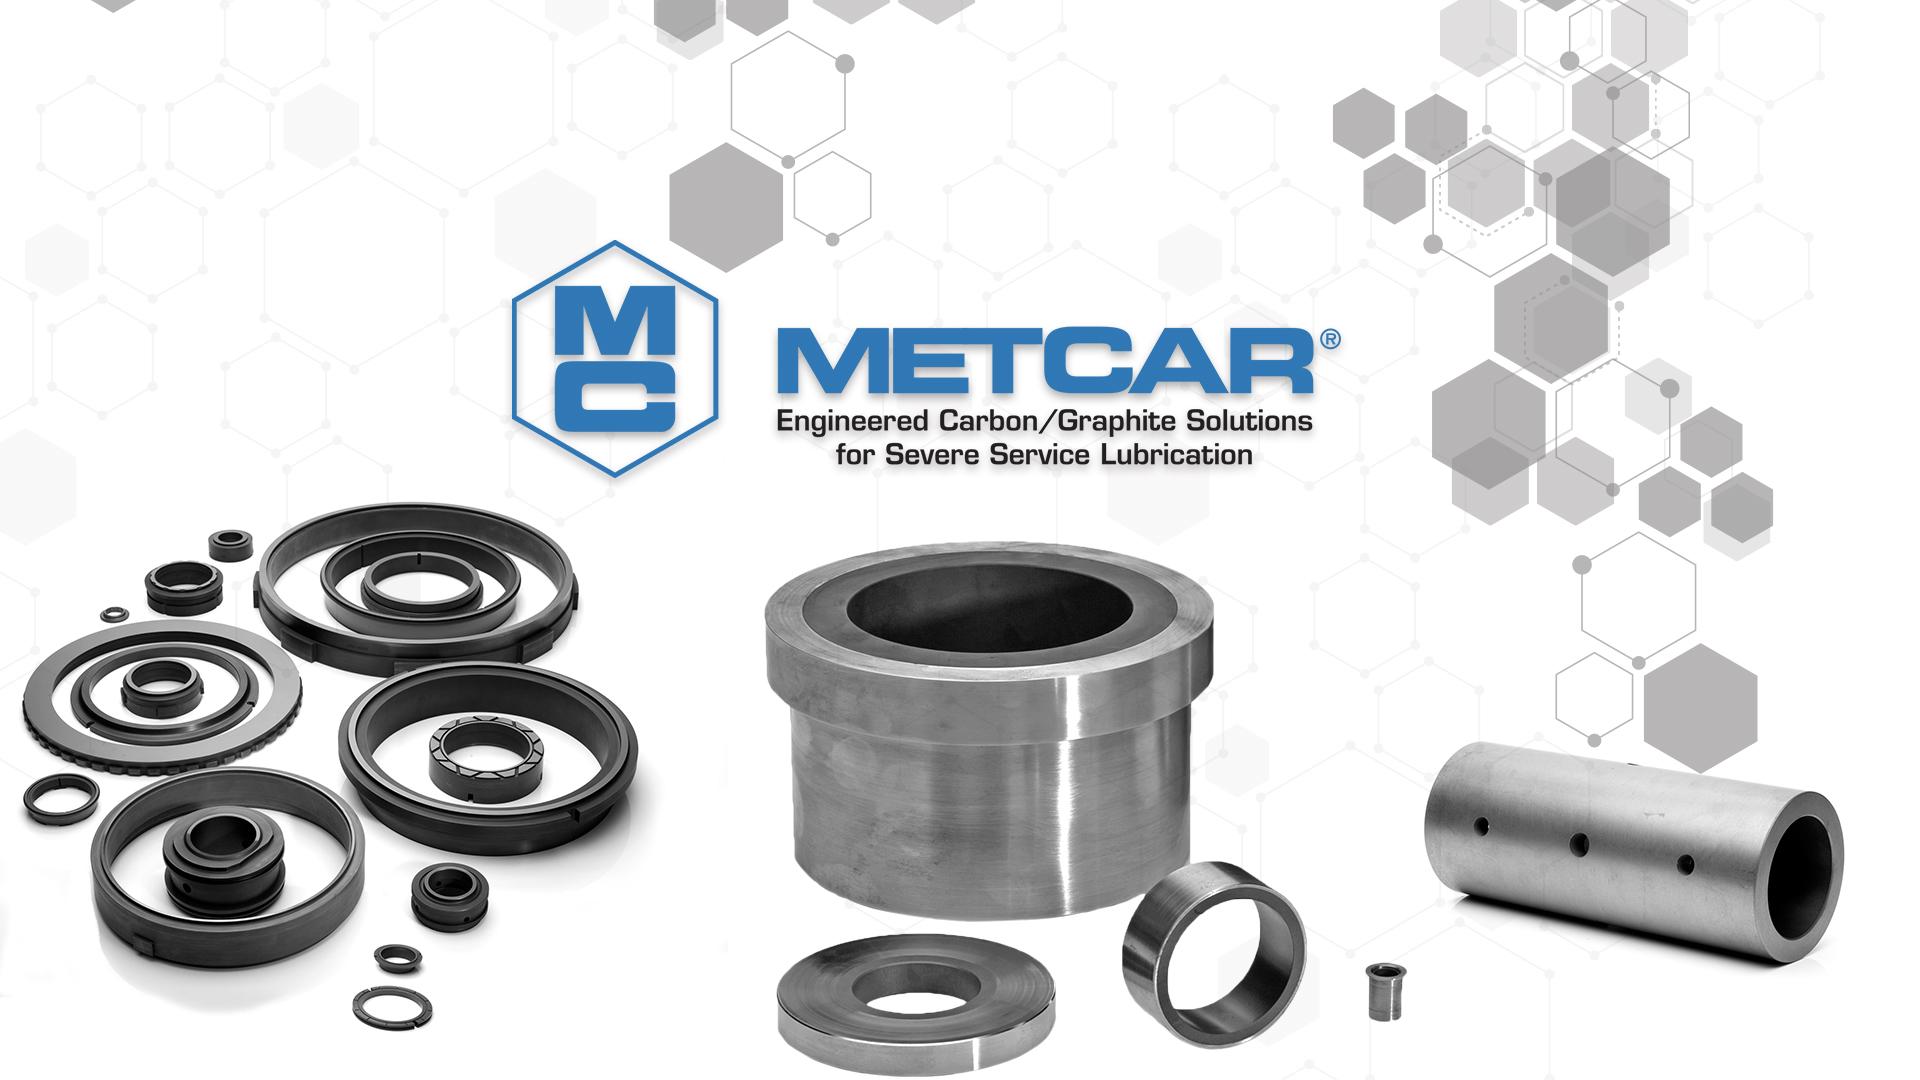 METCAR® Carbon Graphite